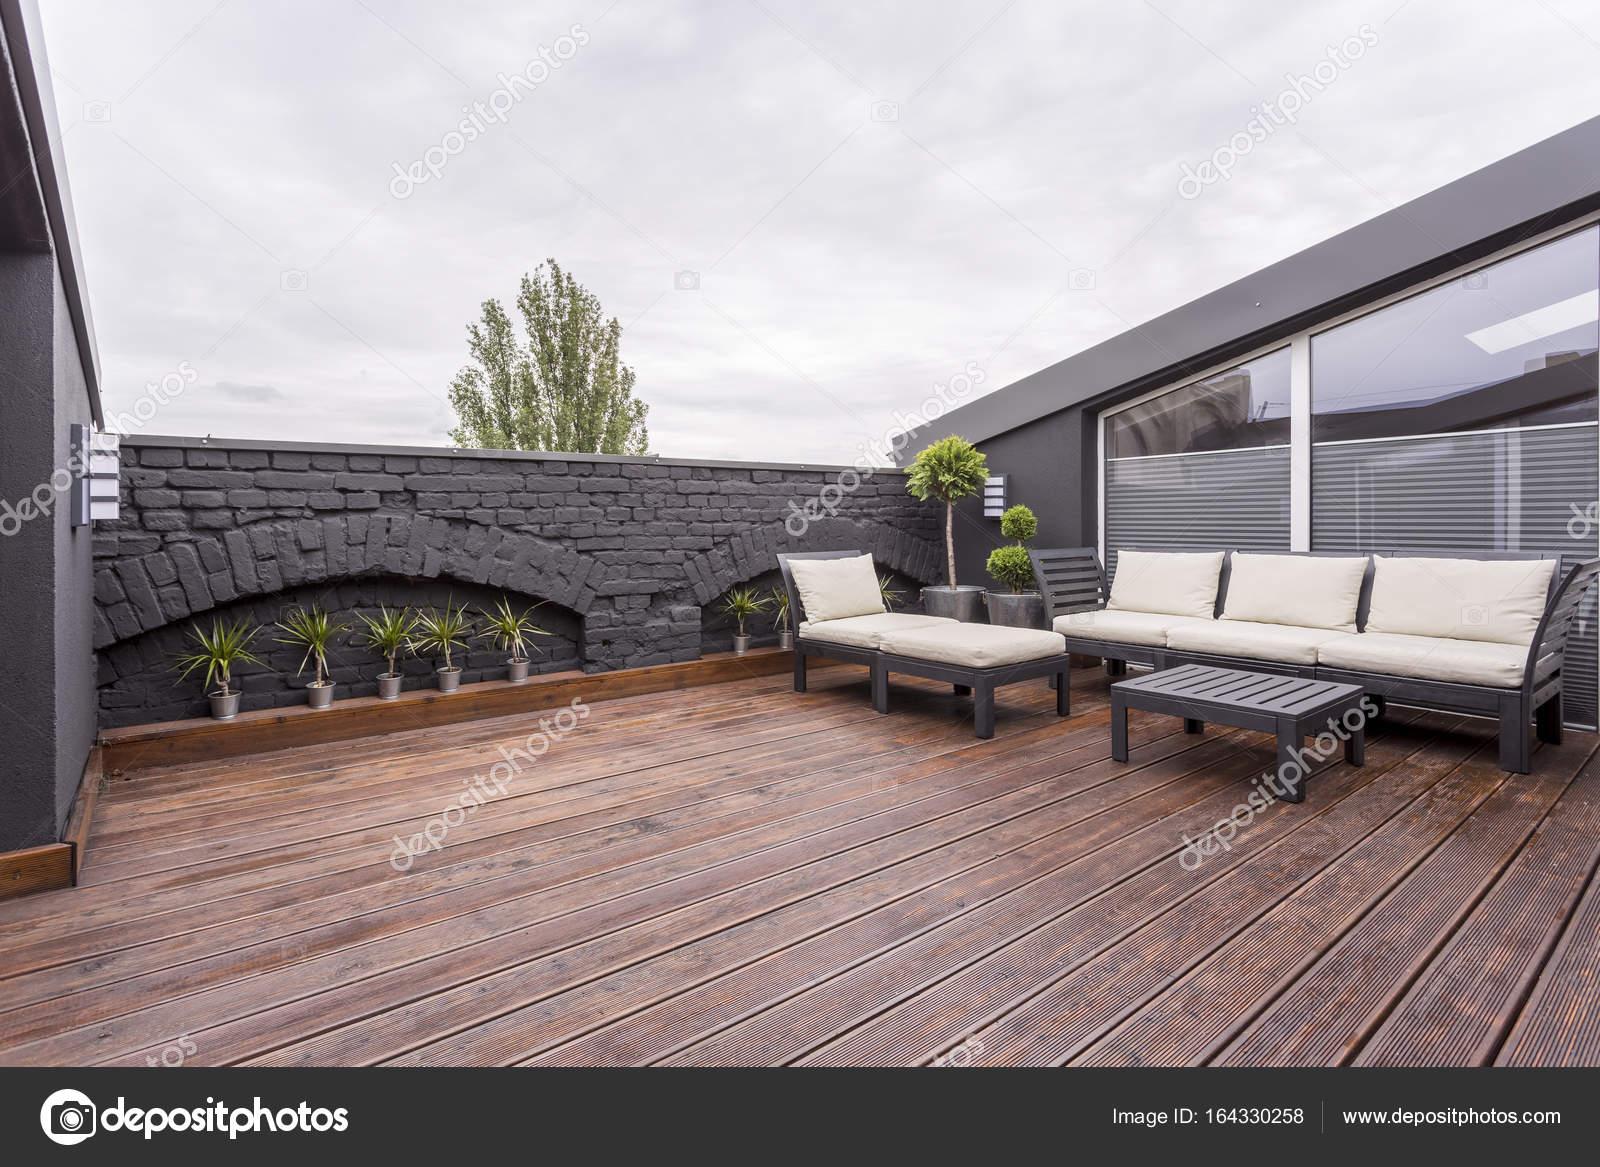 Muebles de jardín en terraza — Fotos de Stock © photographee.eu ...